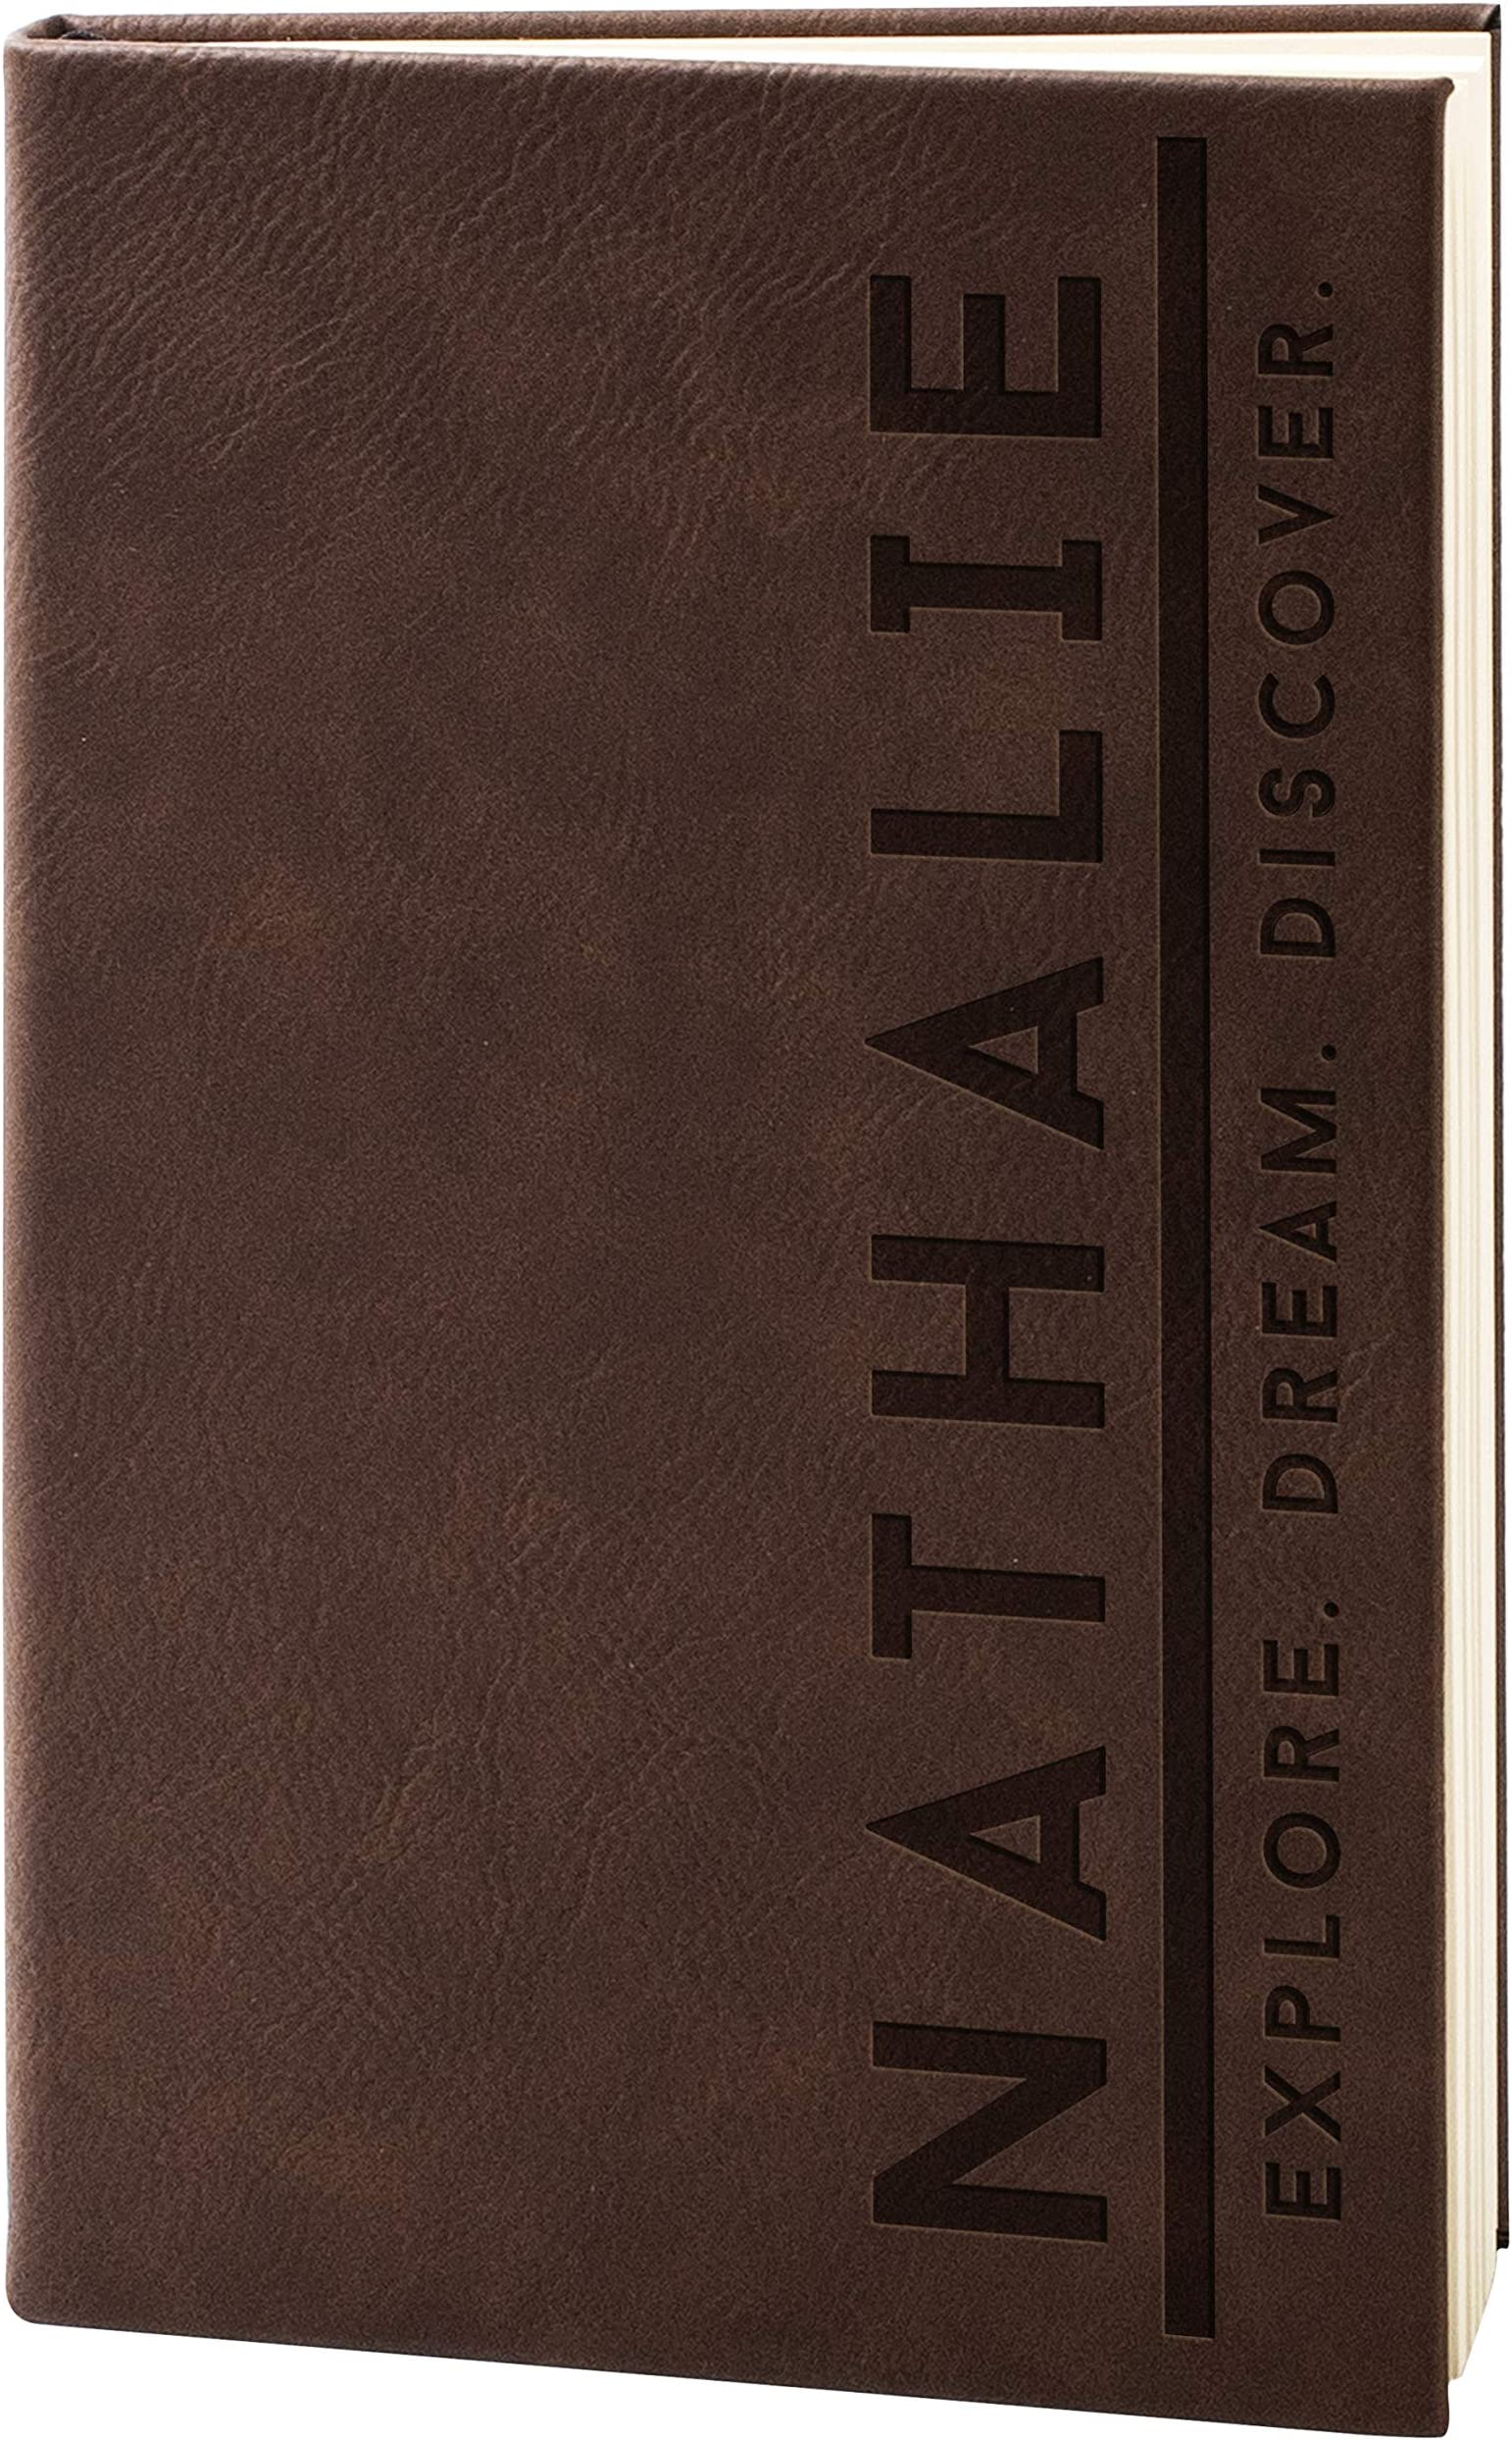 Vitruvian man  journal dream journal personalized diary writing journal moleskine notebook gift for travel writing notebook